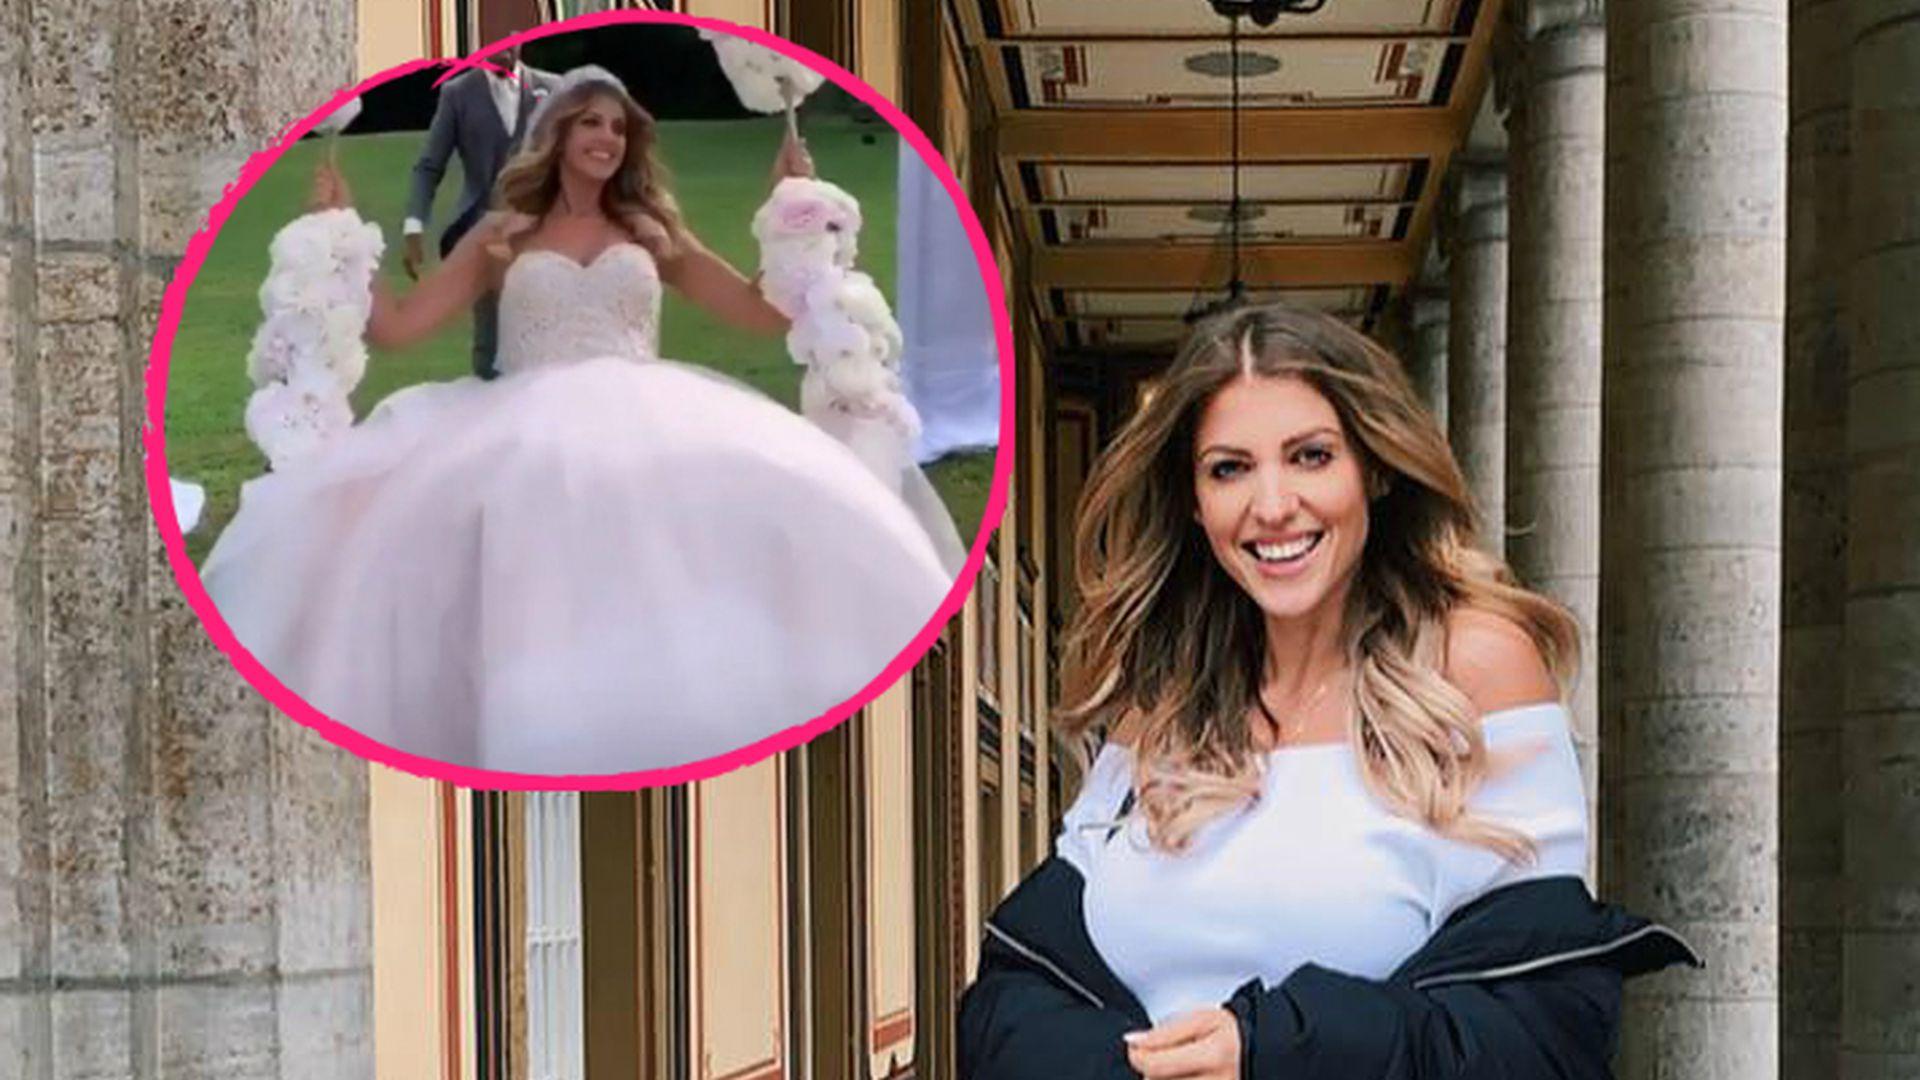 Erster Blick: So pompös ist Sarah Harrisons Brautkleid  Promiflash.de